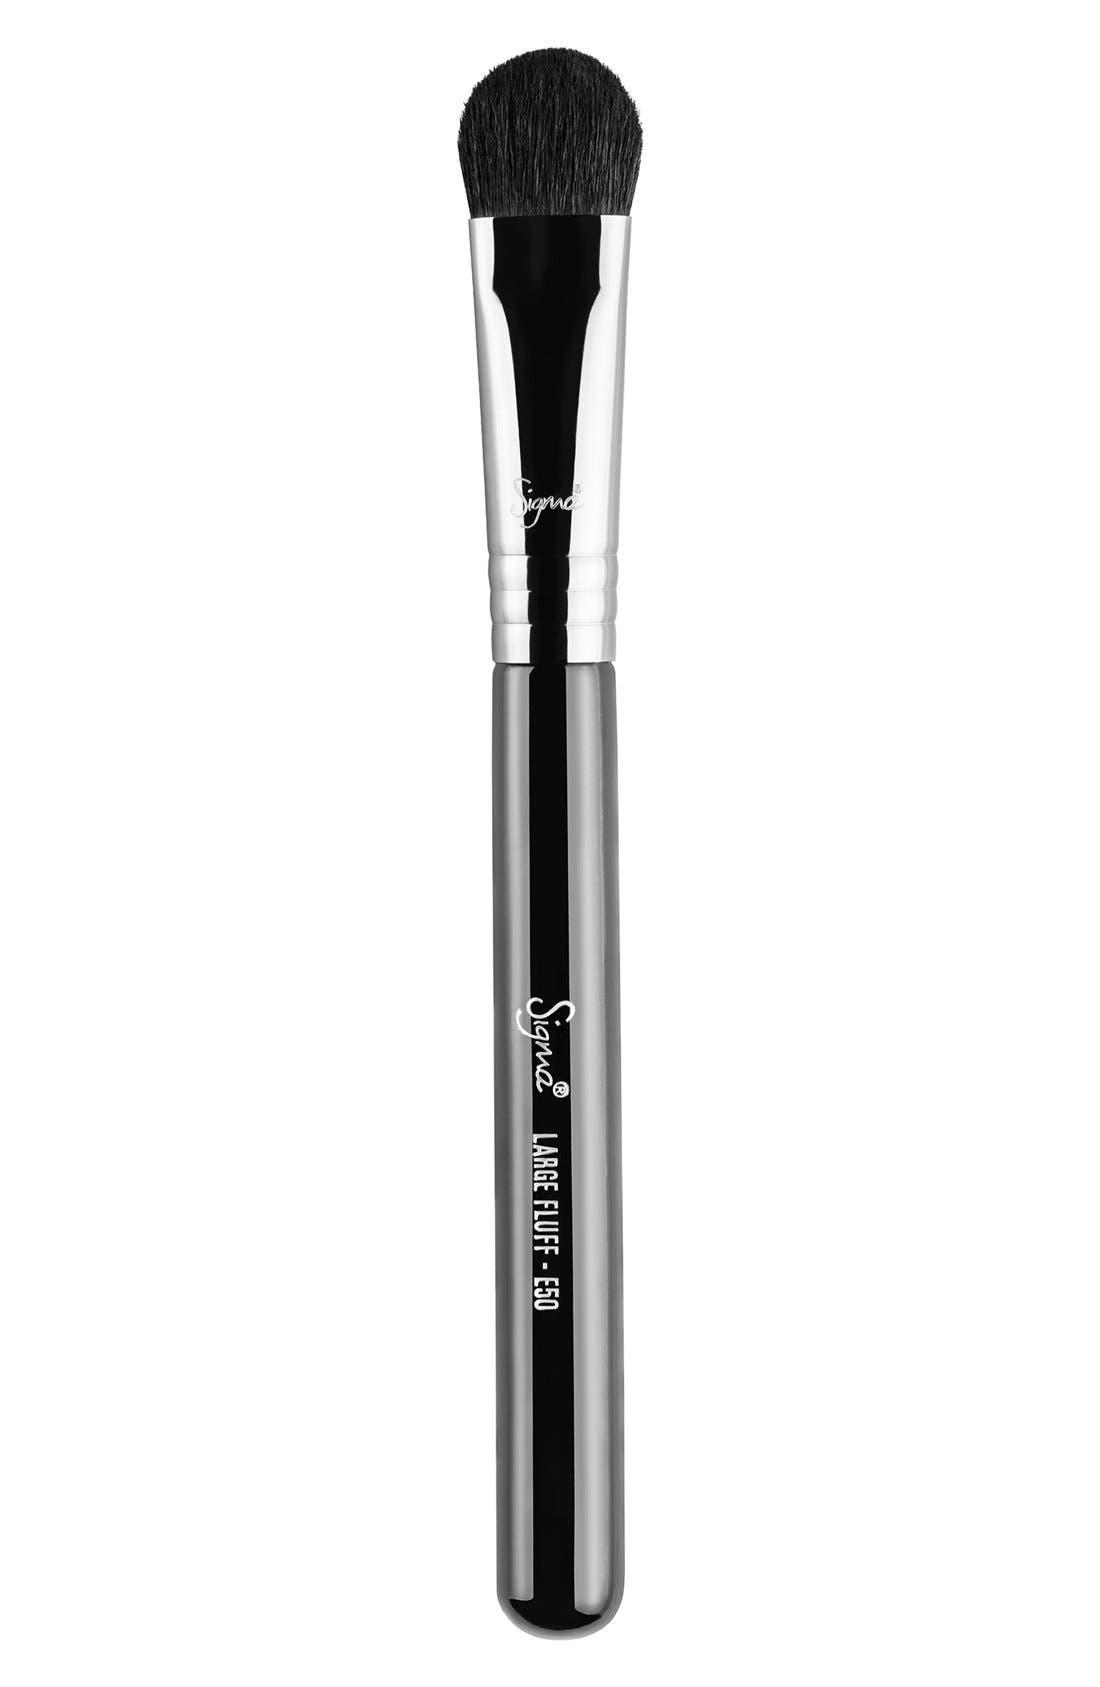 E50 Large Fluff Brush,                         Main,                         color, NO COLOR